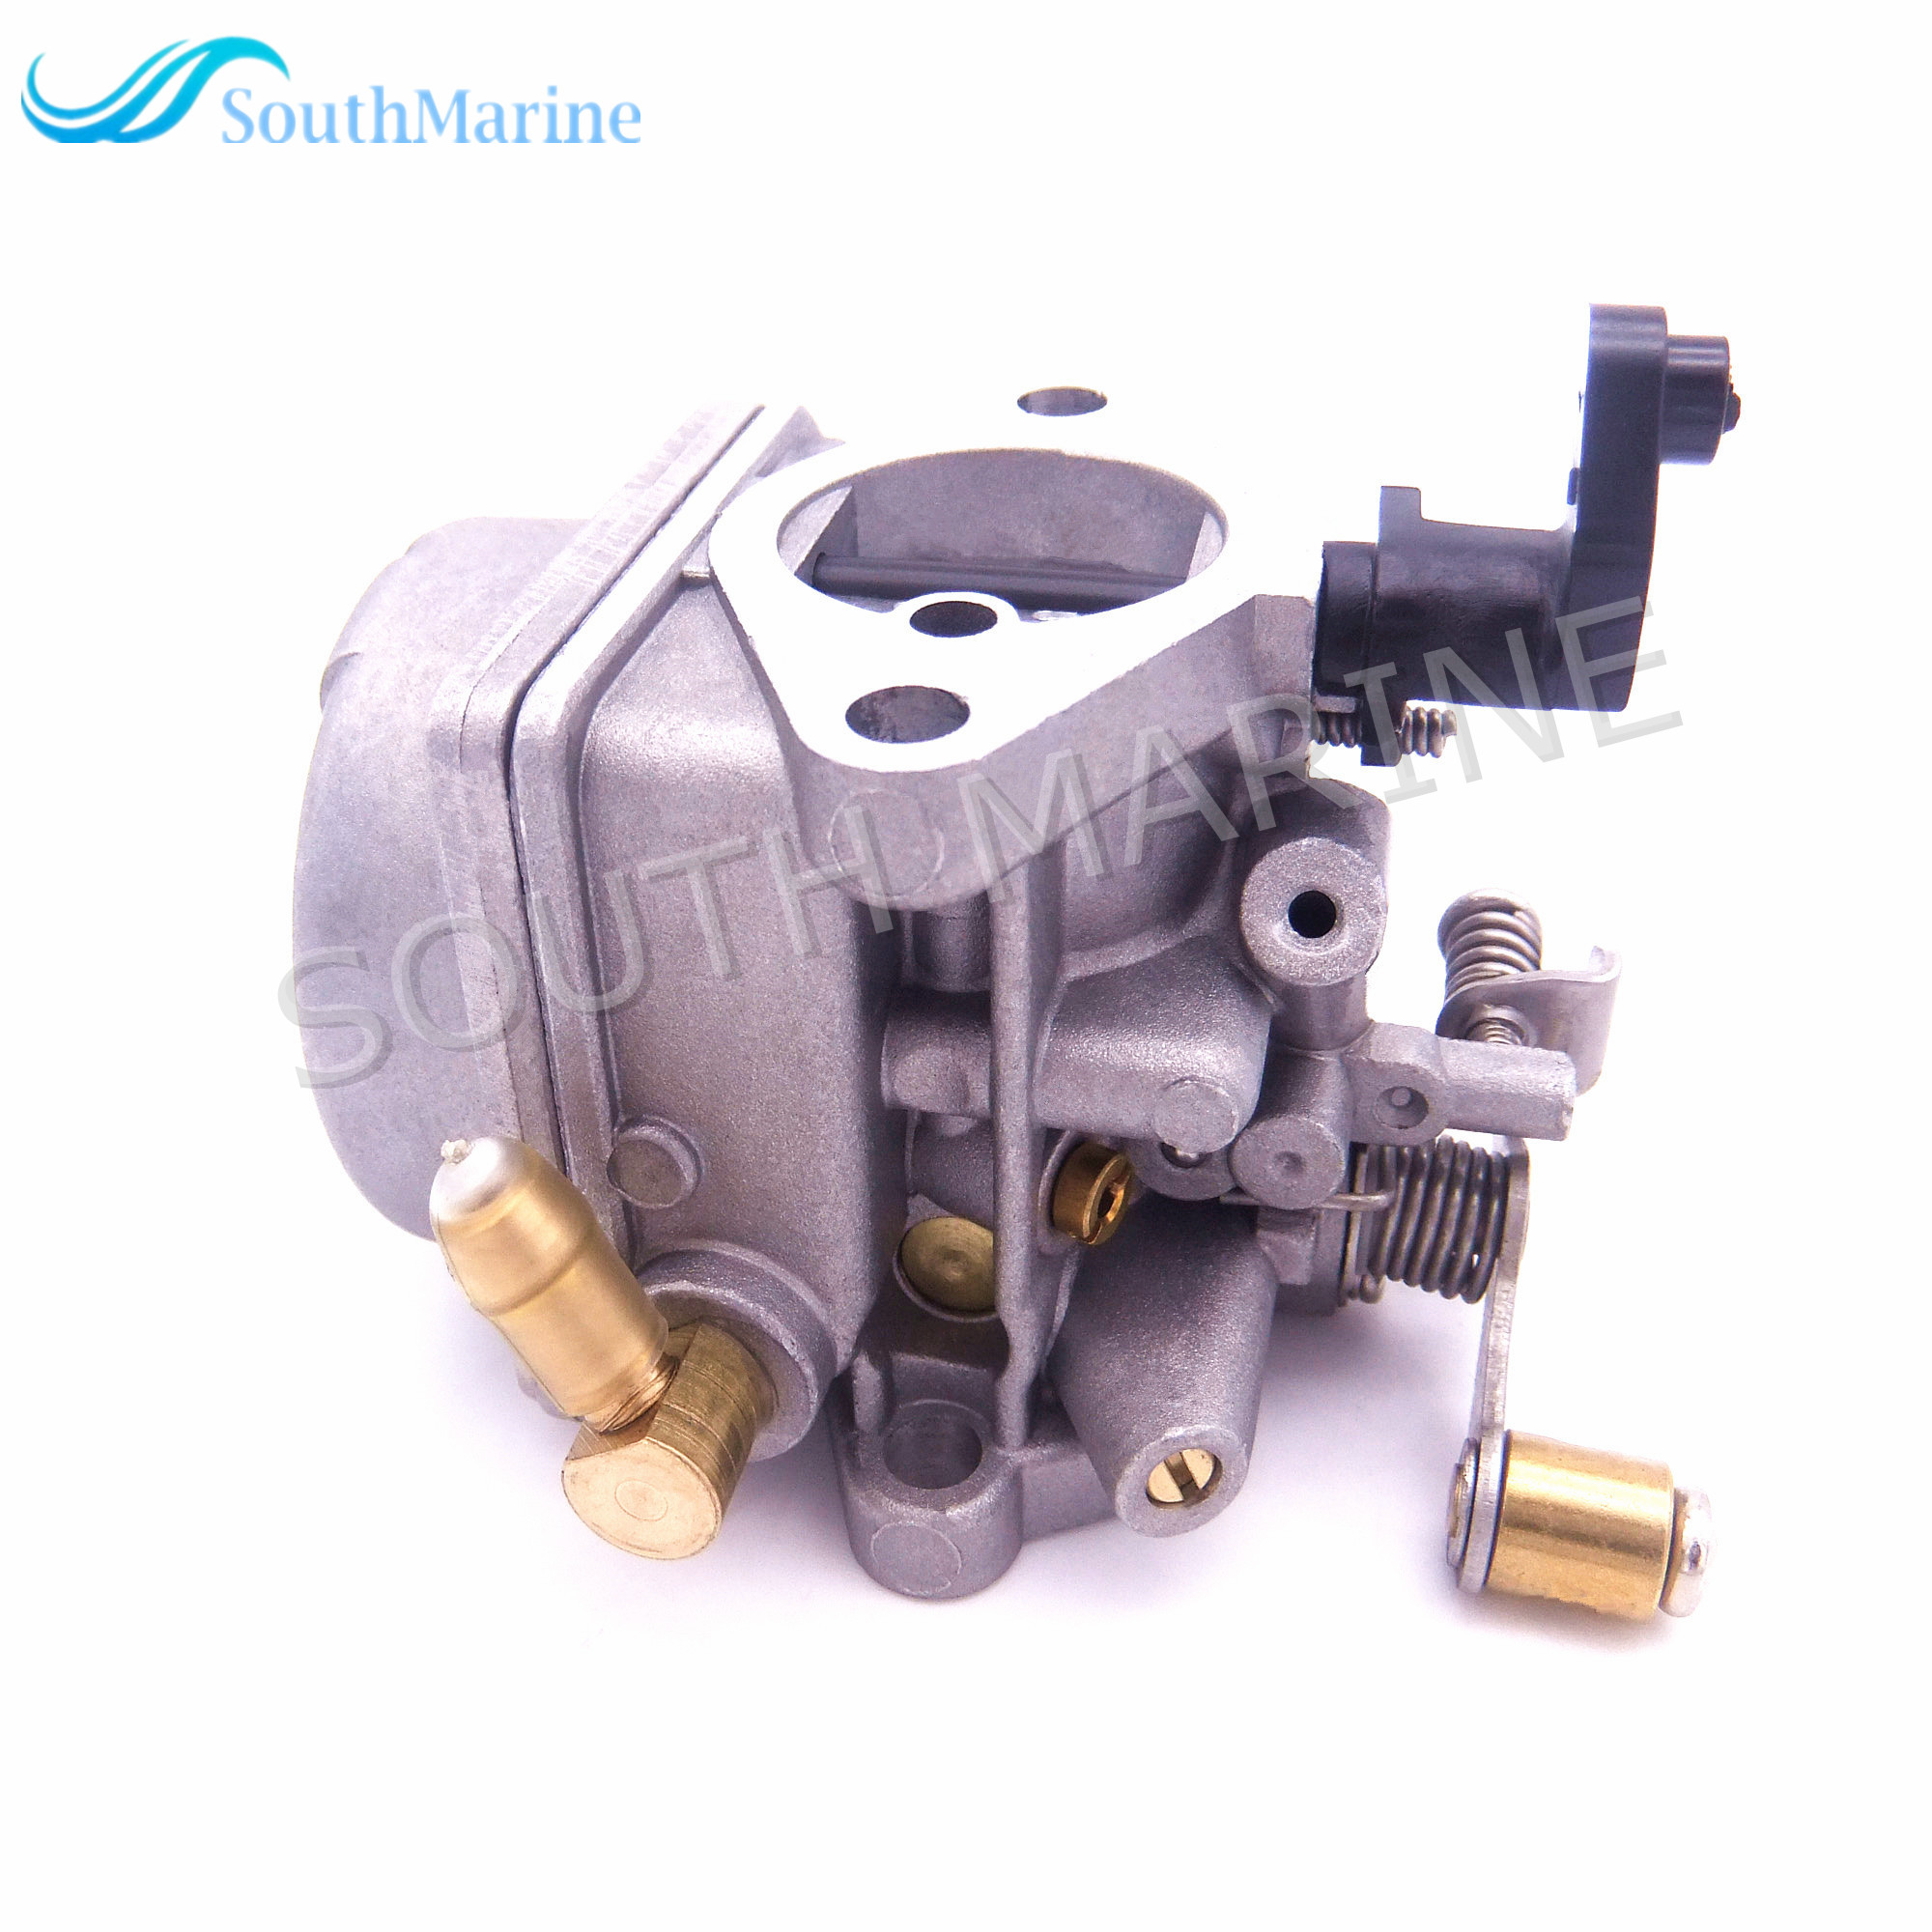 F6-04060000 Carburetor Assy for Parsun HDX Makara F5A F6A Boat Outboard MotorF6-04060000 Carburetor Assy for Parsun HDX Makara F5A F6A Boat Outboard Motor